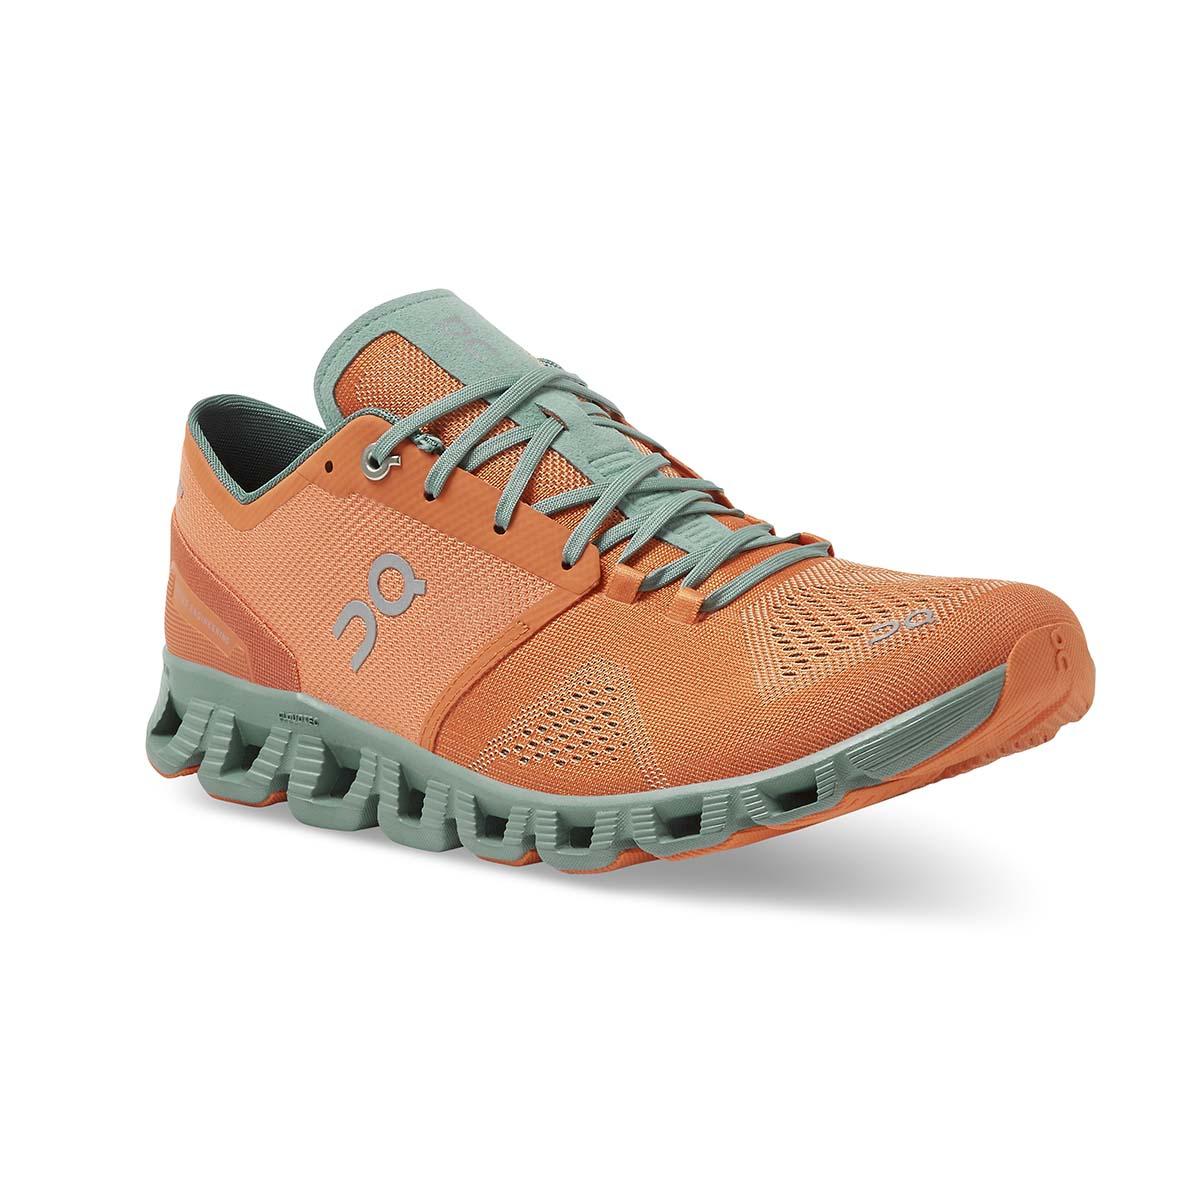 Men's On Cloud X 2.0 Running Shoe - Color: Orange/Sea - Size: 7 - Width: Regular, Orange/Sea, large, image 2